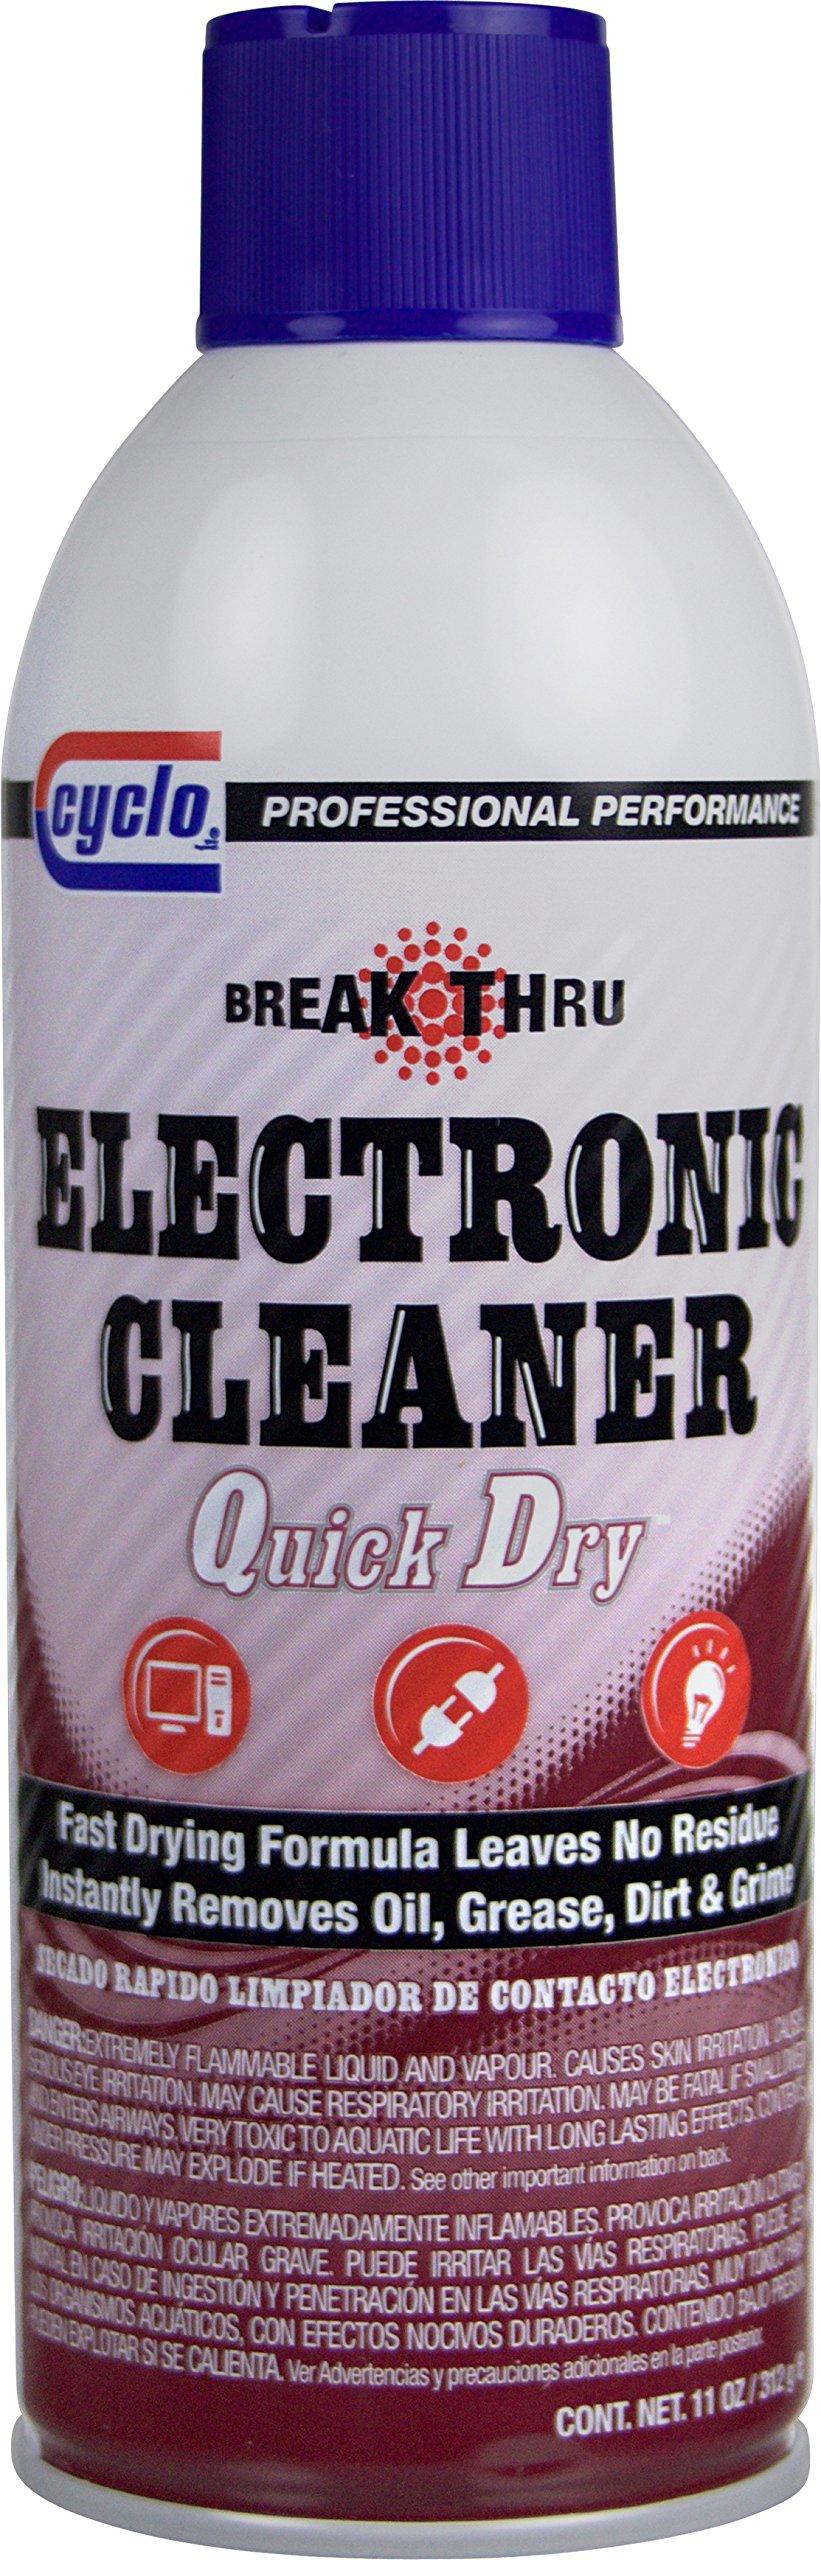 Niteo Cyclo Break Thru Electronic Cleaner, Quick Dry Formula, 11 fl oz, Case of 12